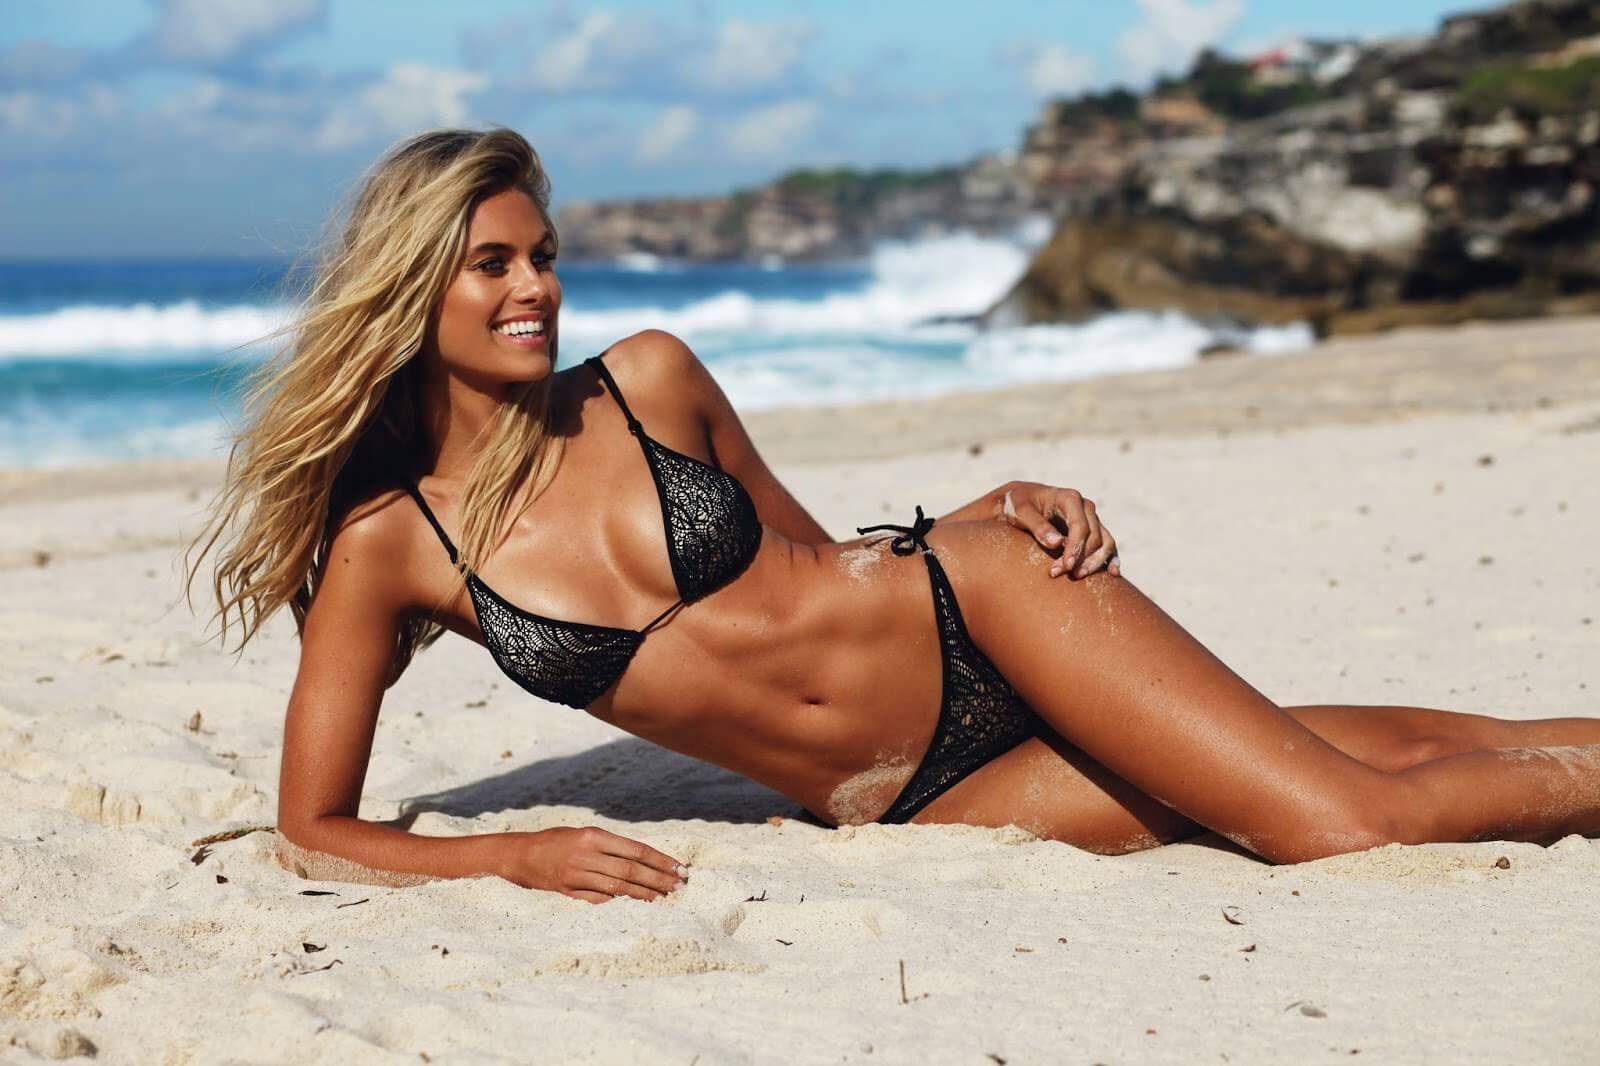 Women's australia beach halter bikini swimwear swimsuit australian flag navy